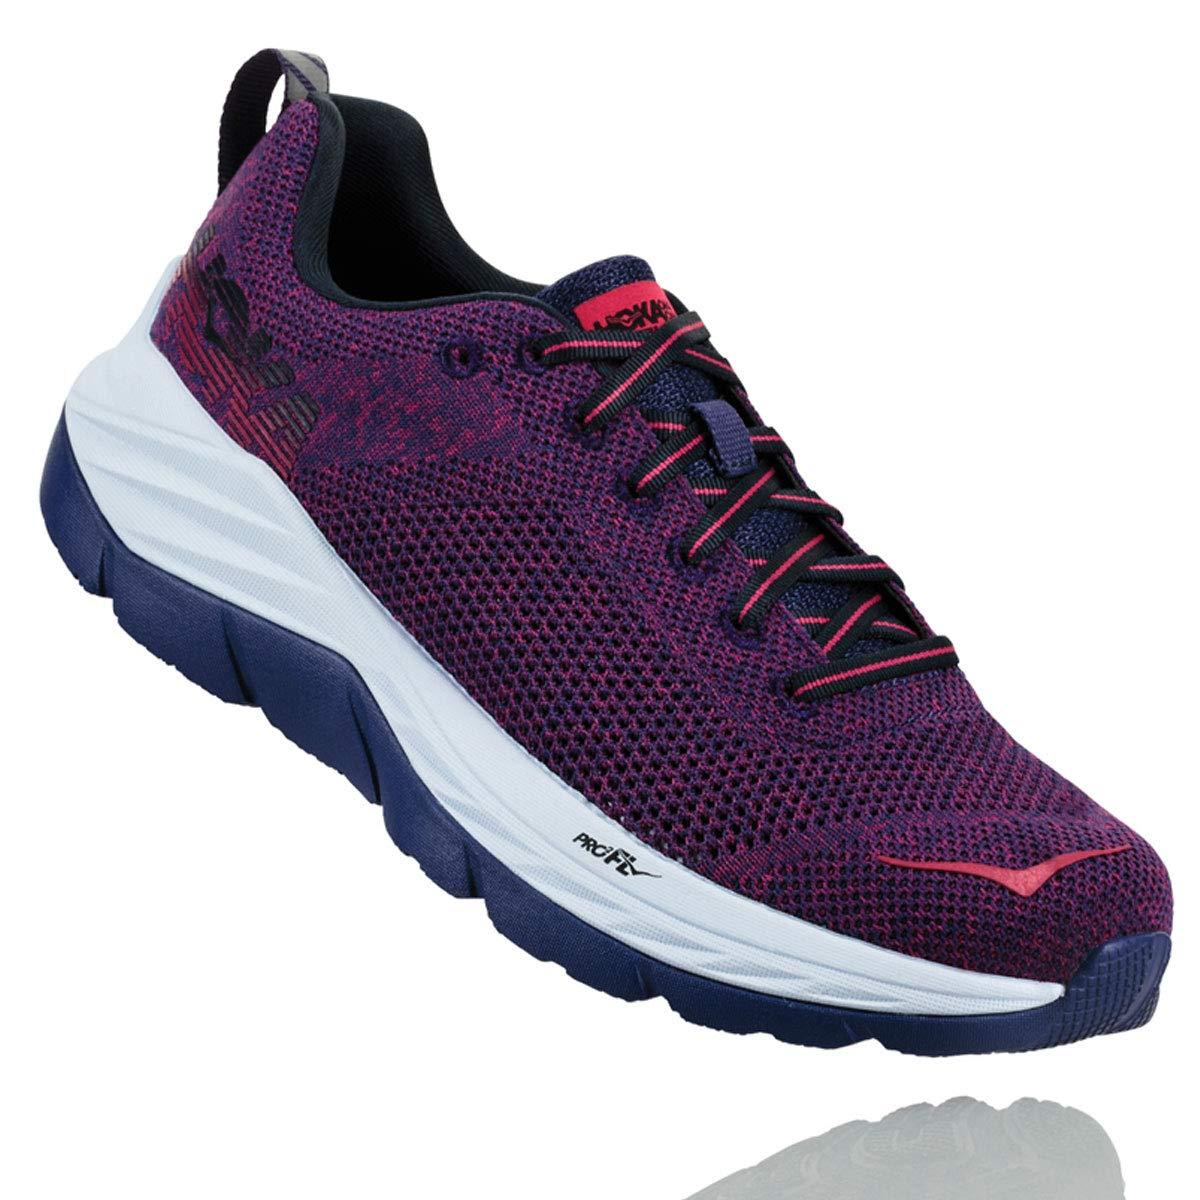 Hoka One One Mach Running Schuhes Damens Blau Ribbon/Sky Blau 2018 Laufsport Schuhe